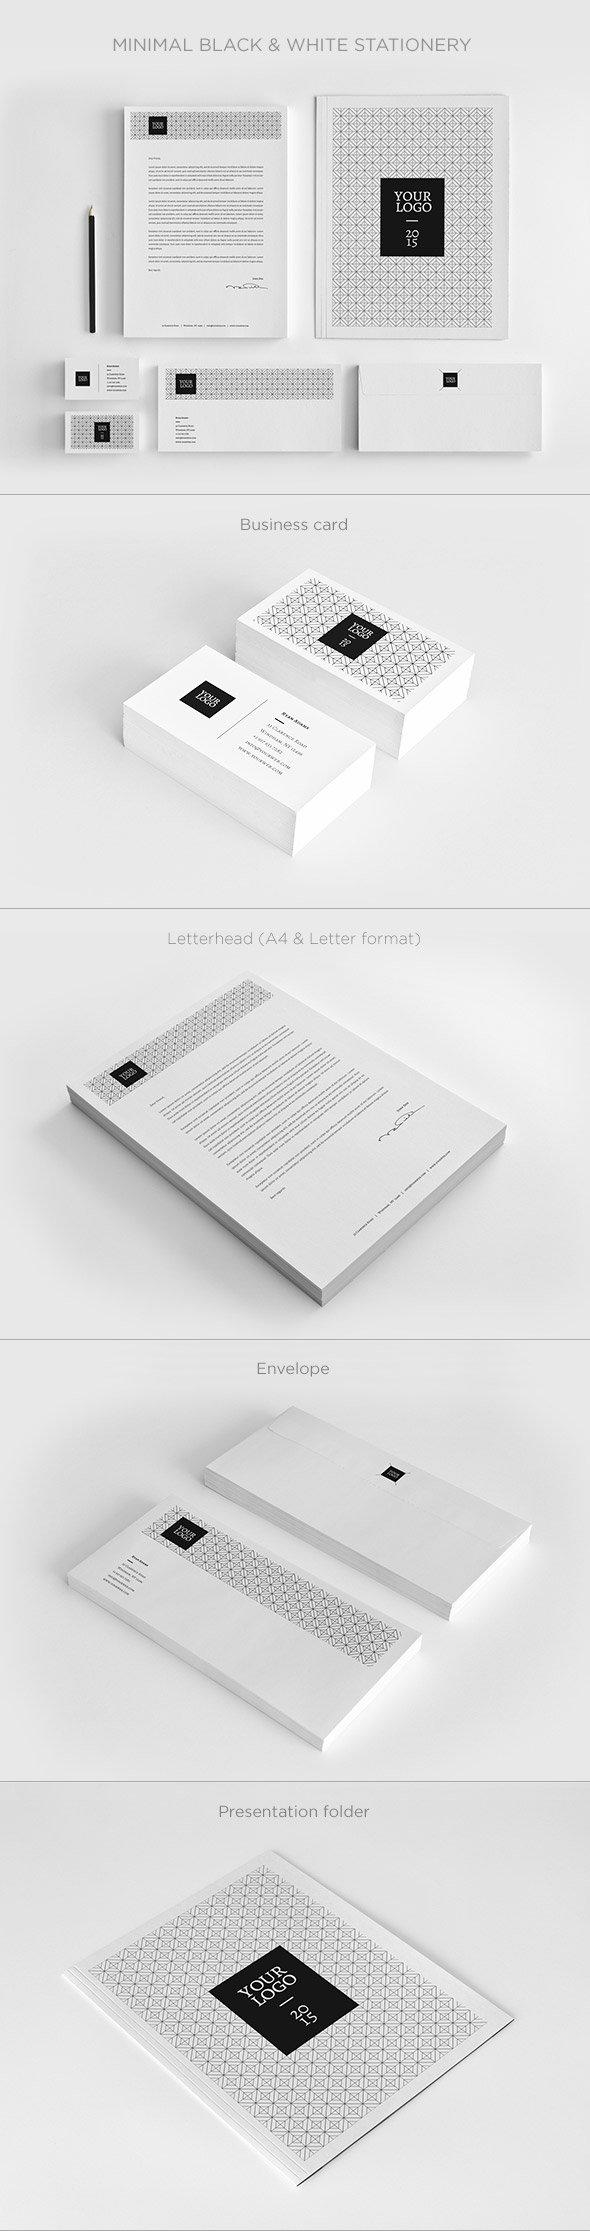 Minimal Black and White Stationery Set